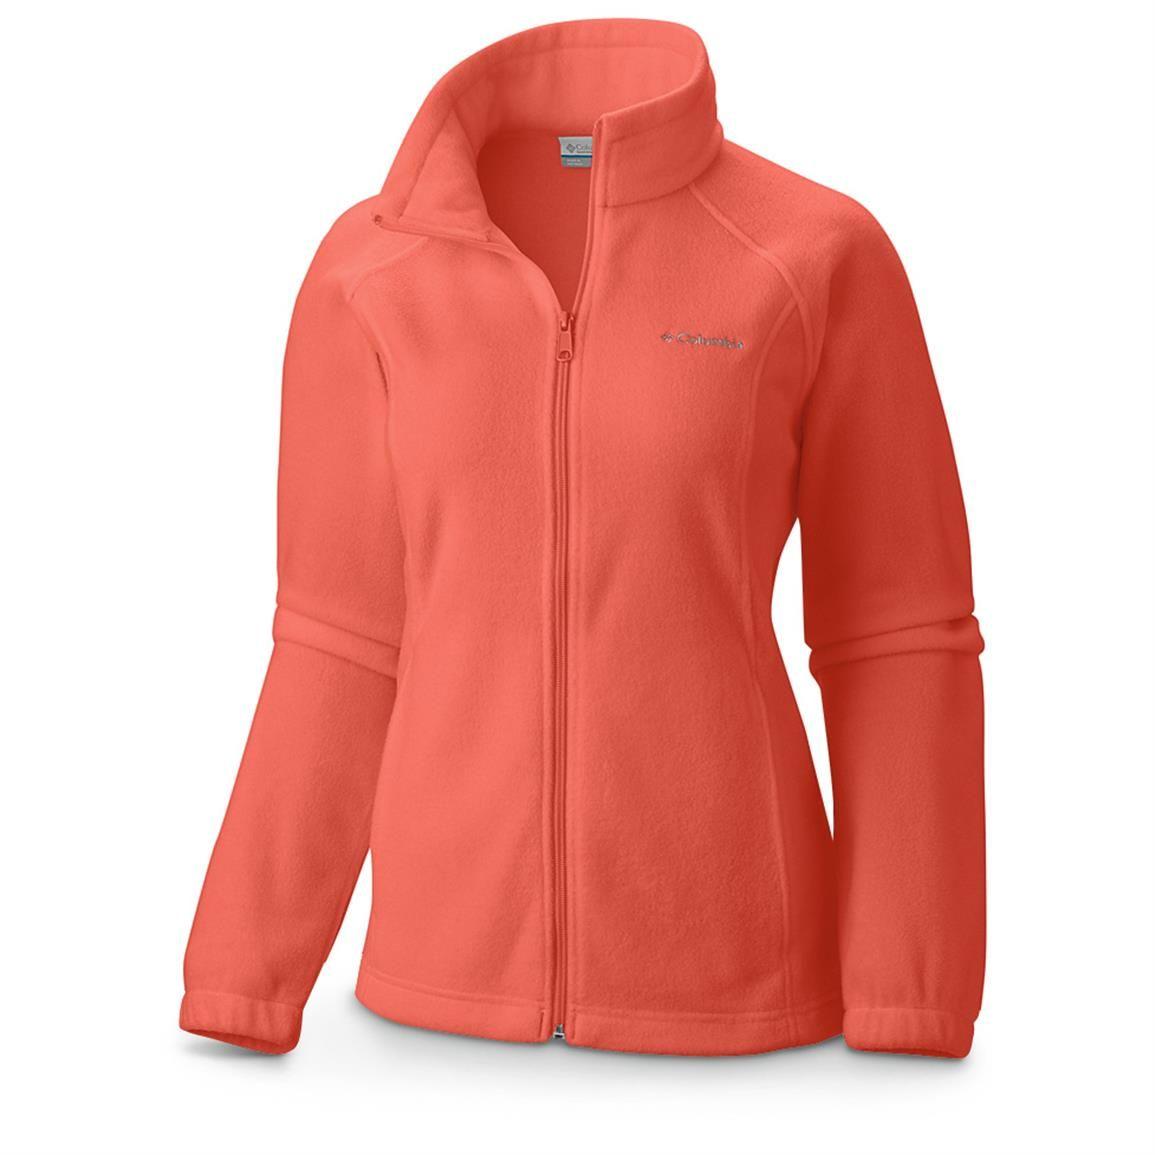 Women's Columbia Fleece Jacket | Women's Clothing | Pinterest ...